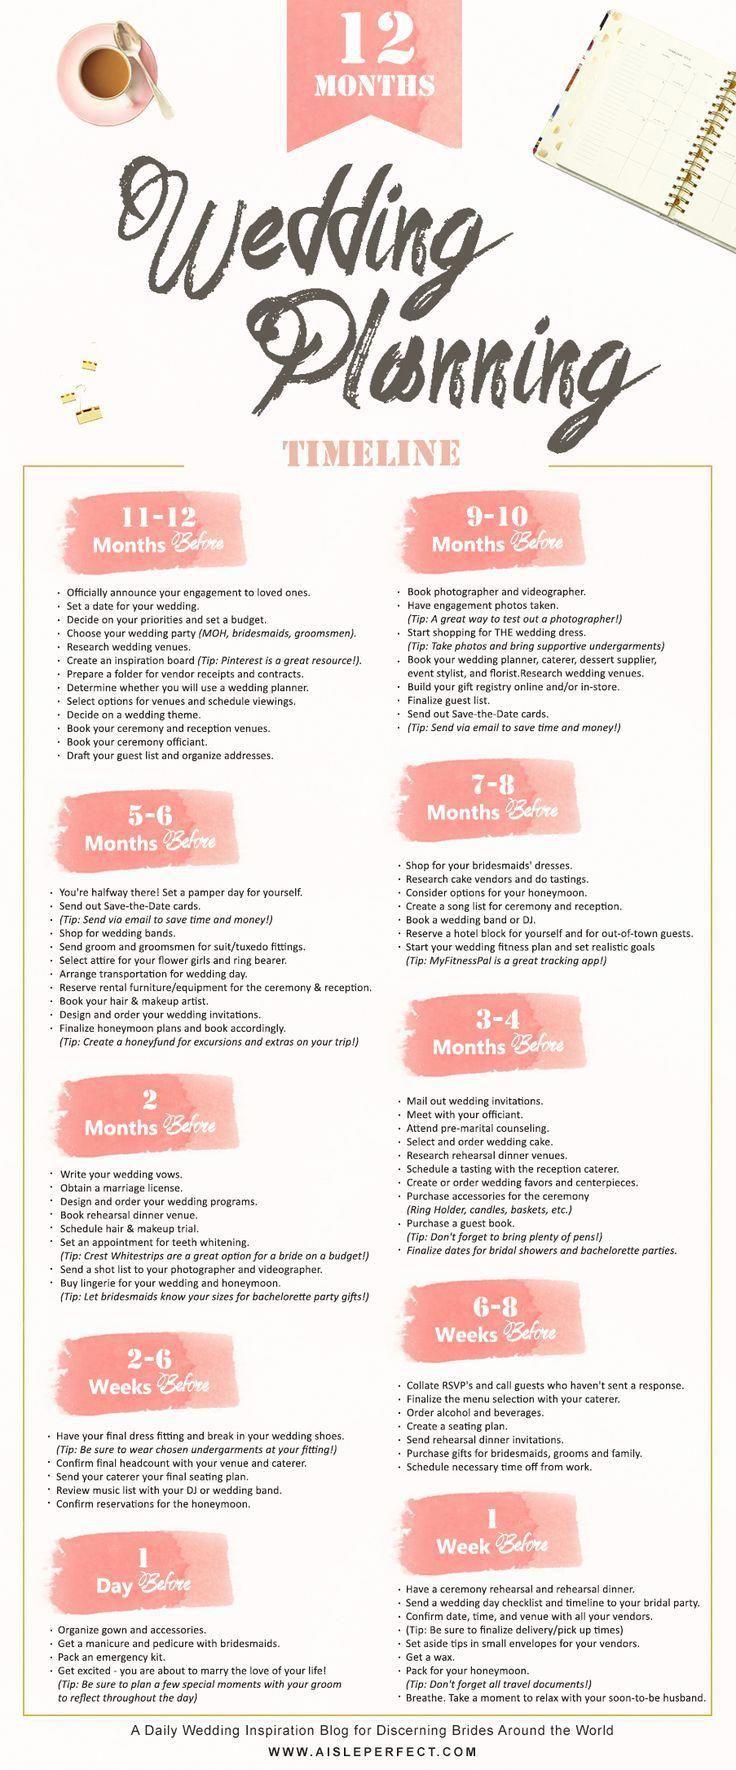 Best Wedding Checklist 0513 Weddingchecklist Wedding Planning Timeline Wedding Planning Guide Wedding Planning Checklist